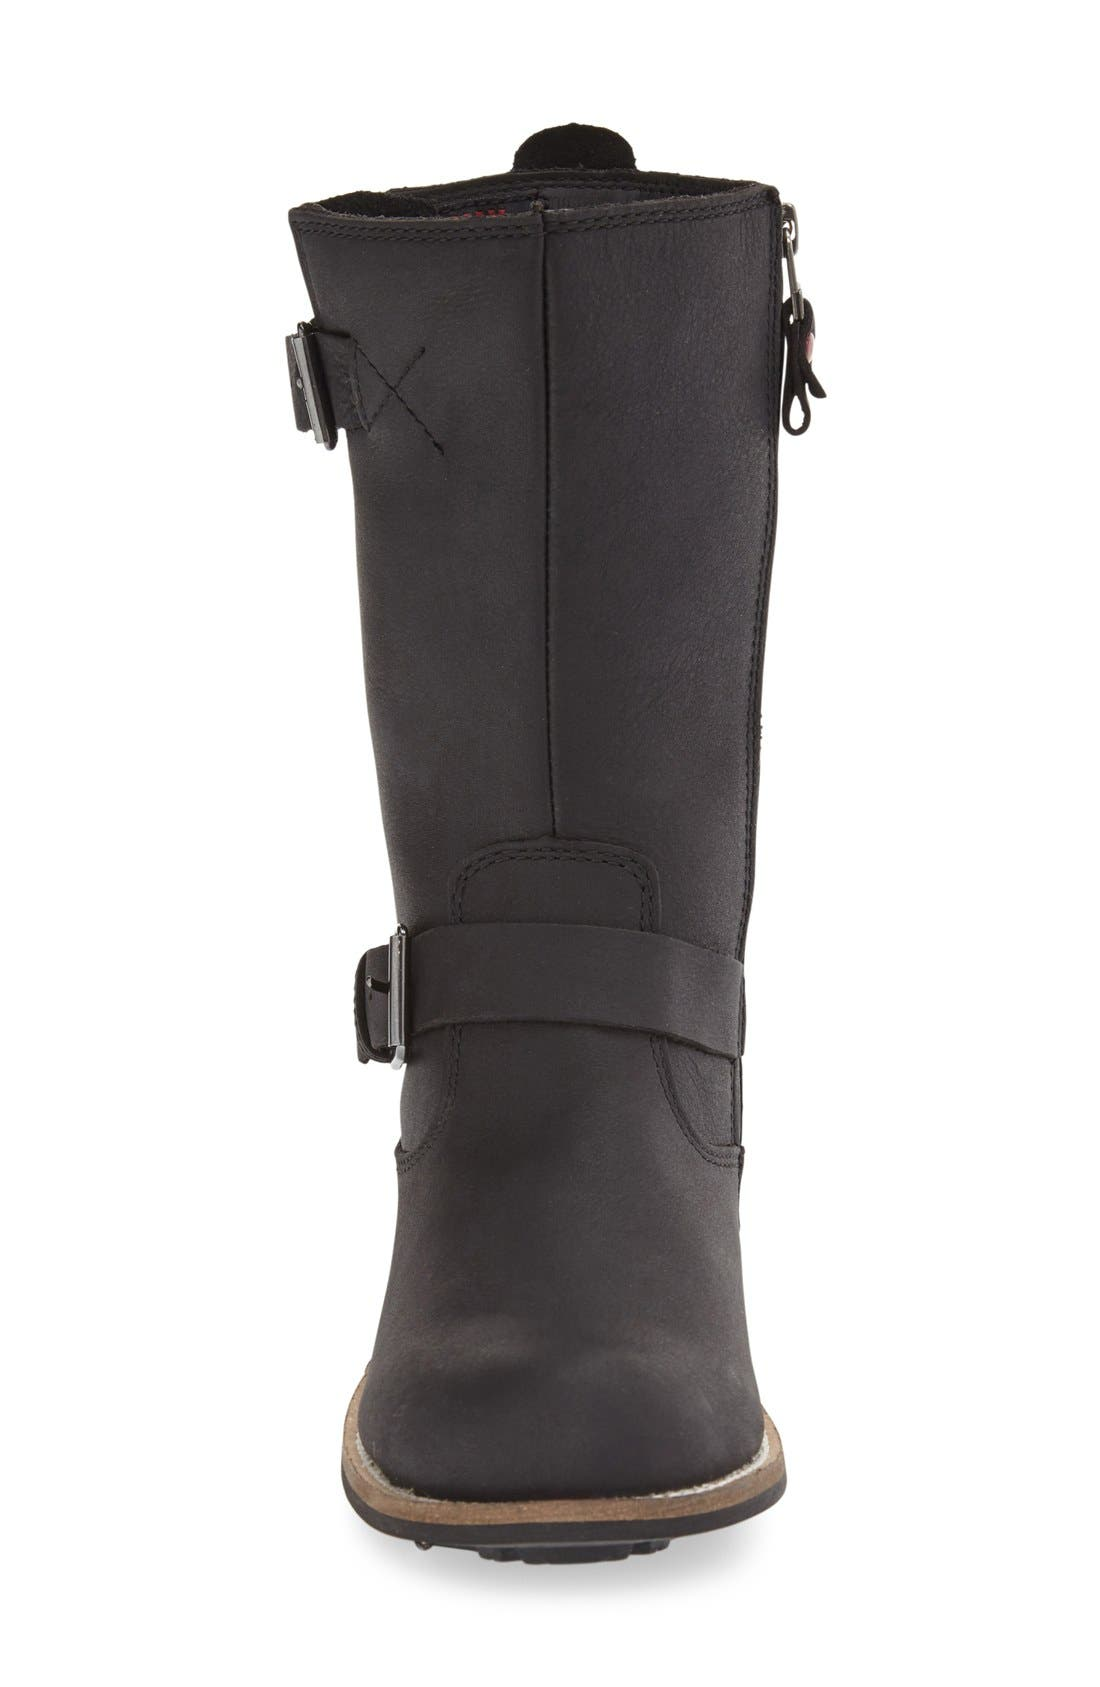 KODIAK,                             'Alcona' Waterproof Boot,                             Alternate thumbnail 4, color,                             BLACK LEATHER